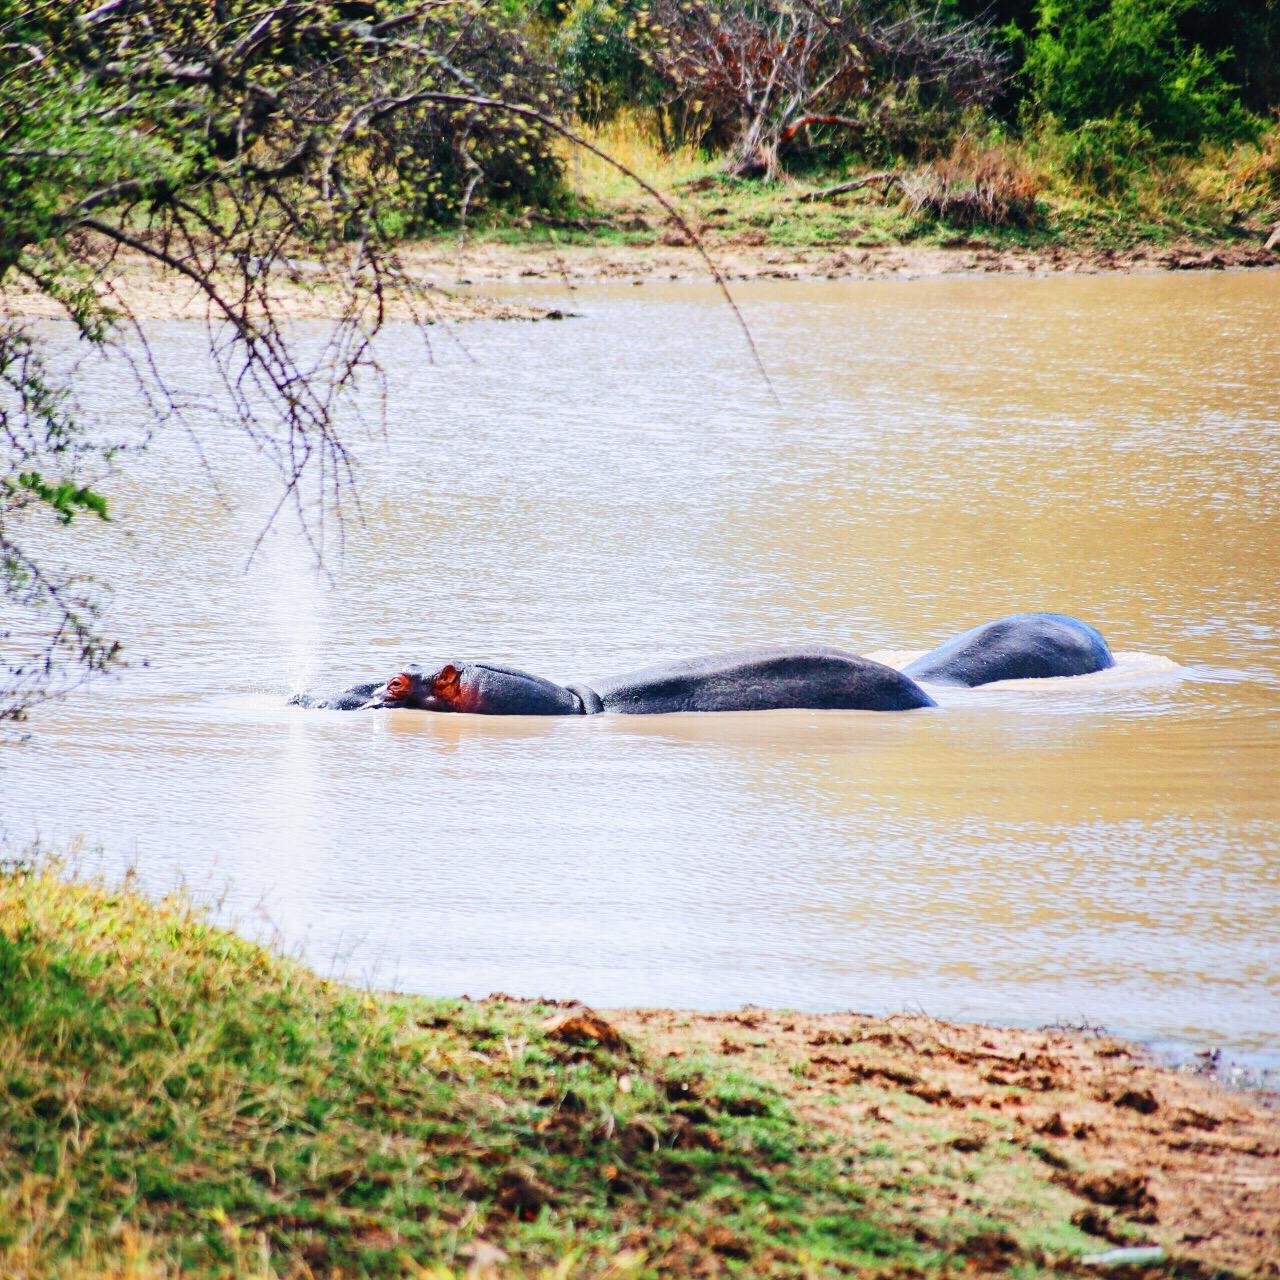 Safari In South Africa - A Photo Diary (19)